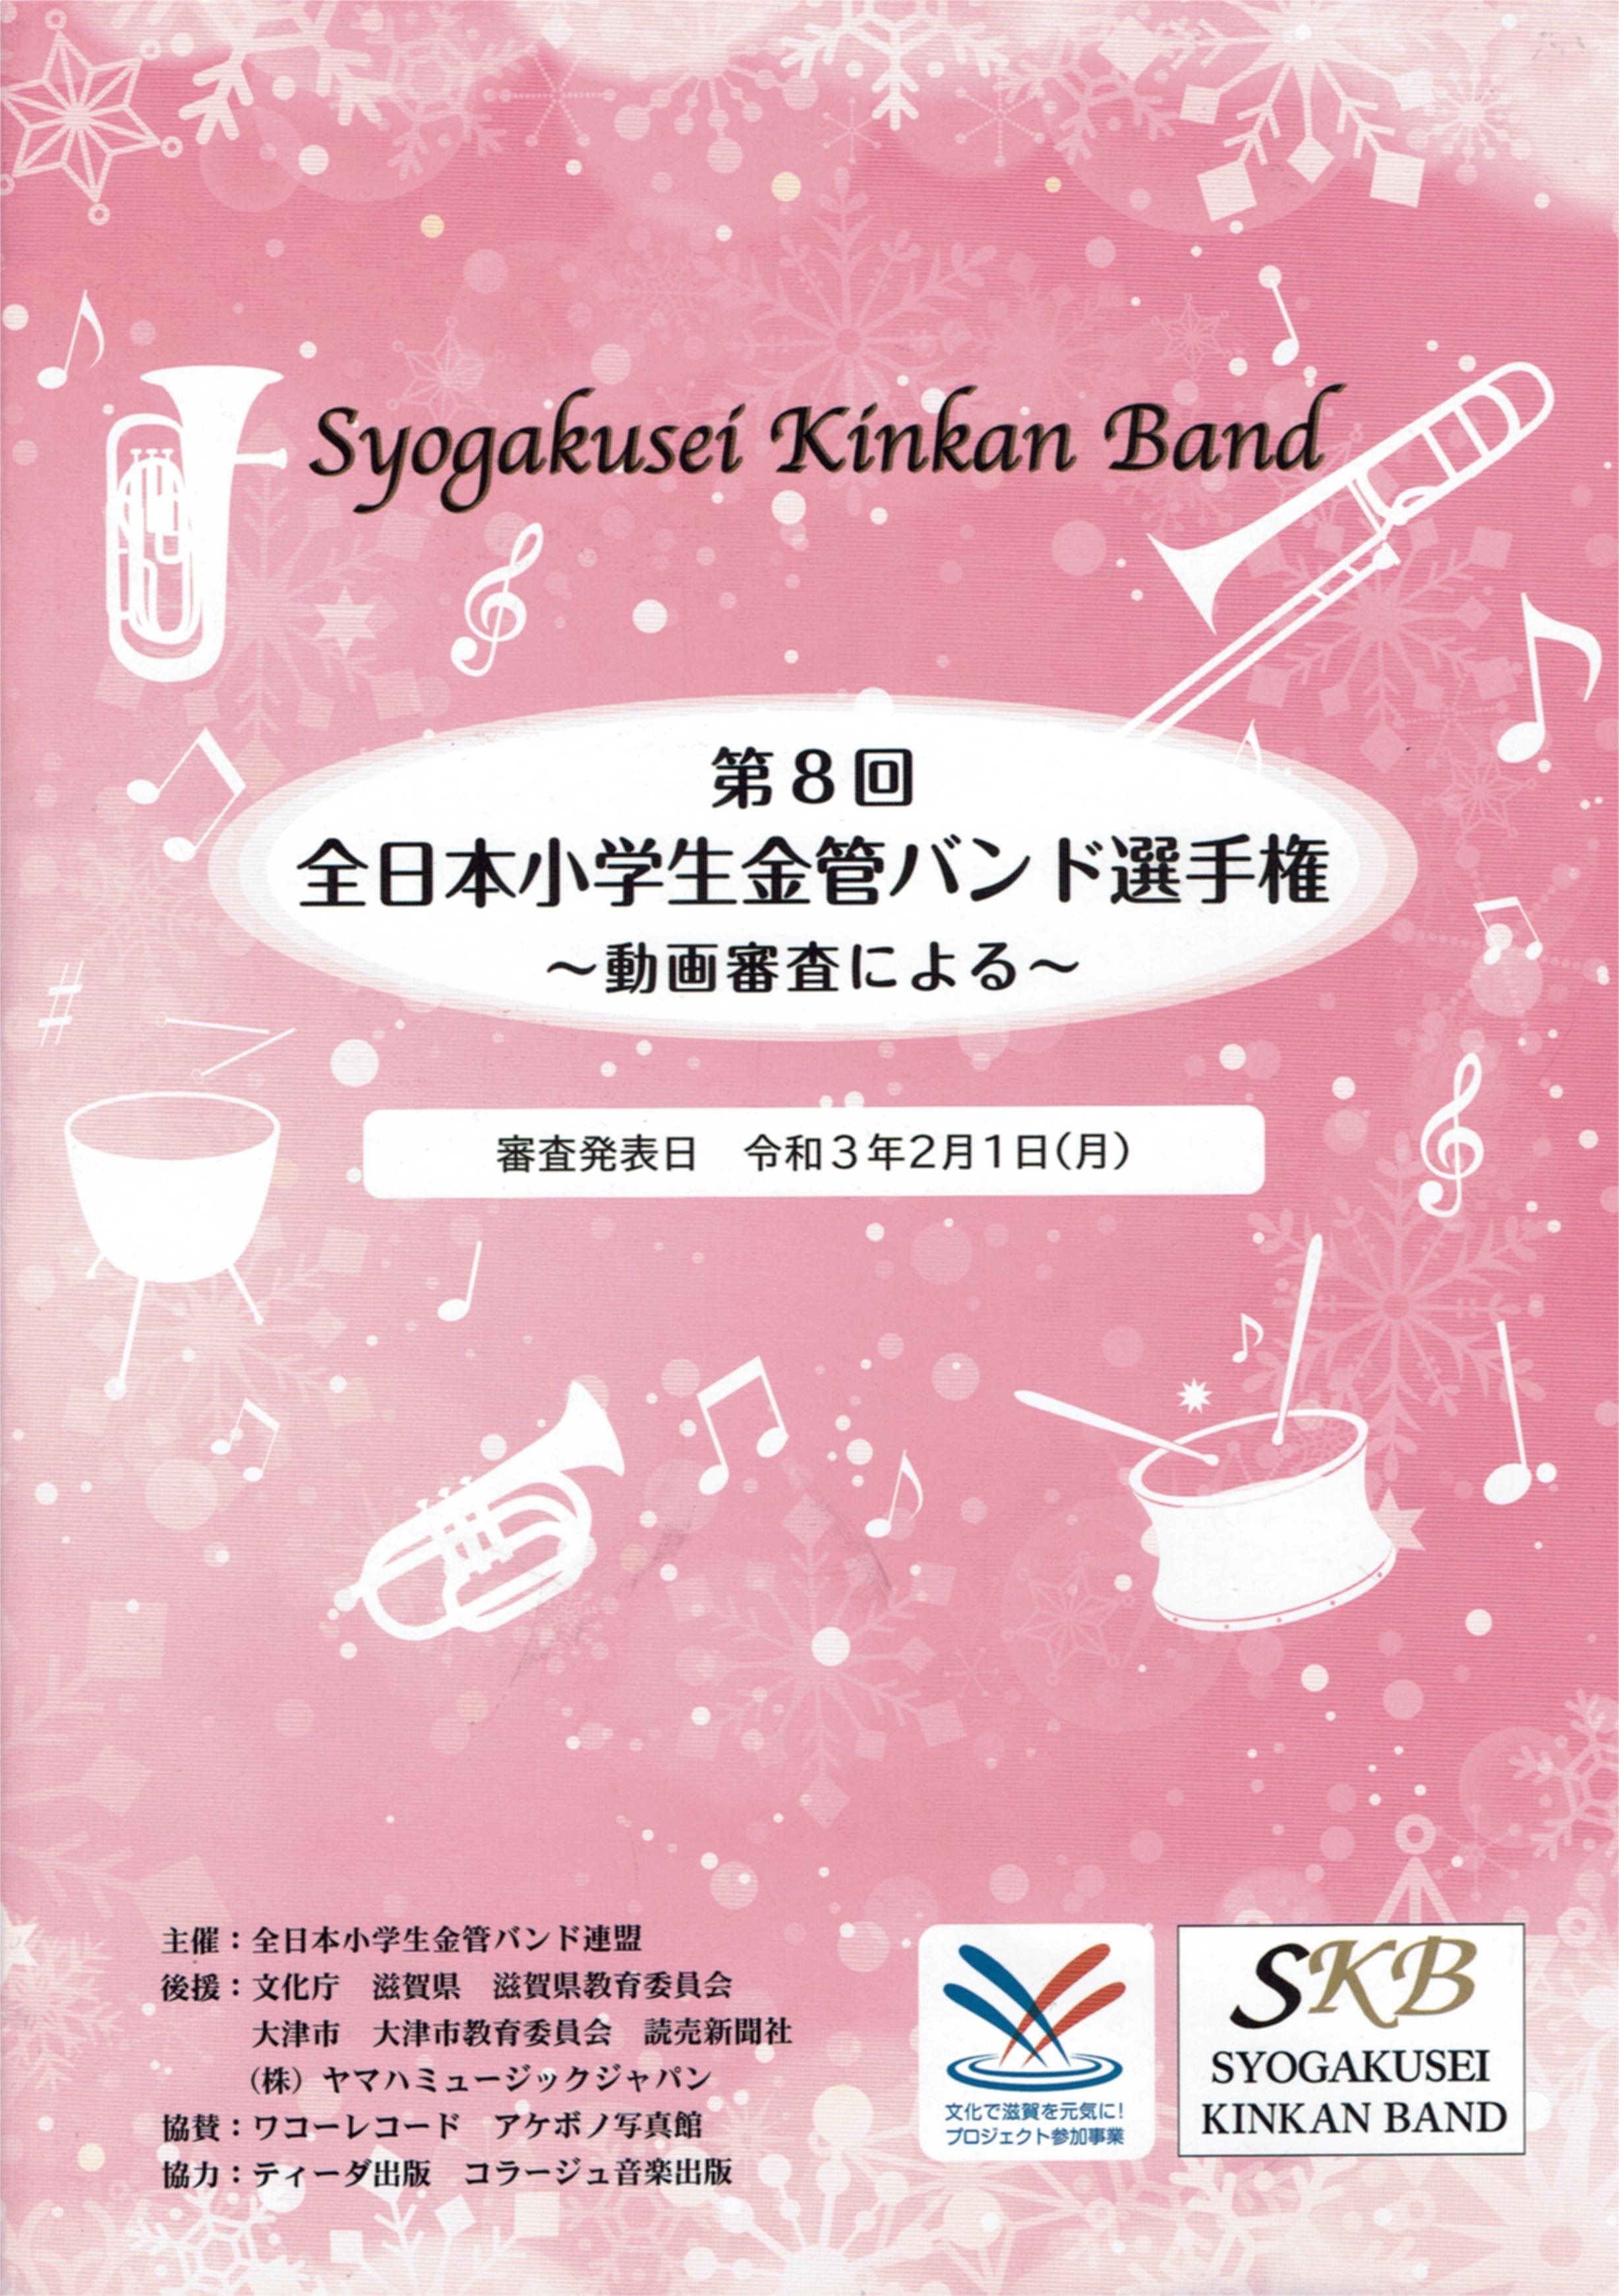 【DVD/Blu-ray】第8回全日本小学生金管バンド選手権